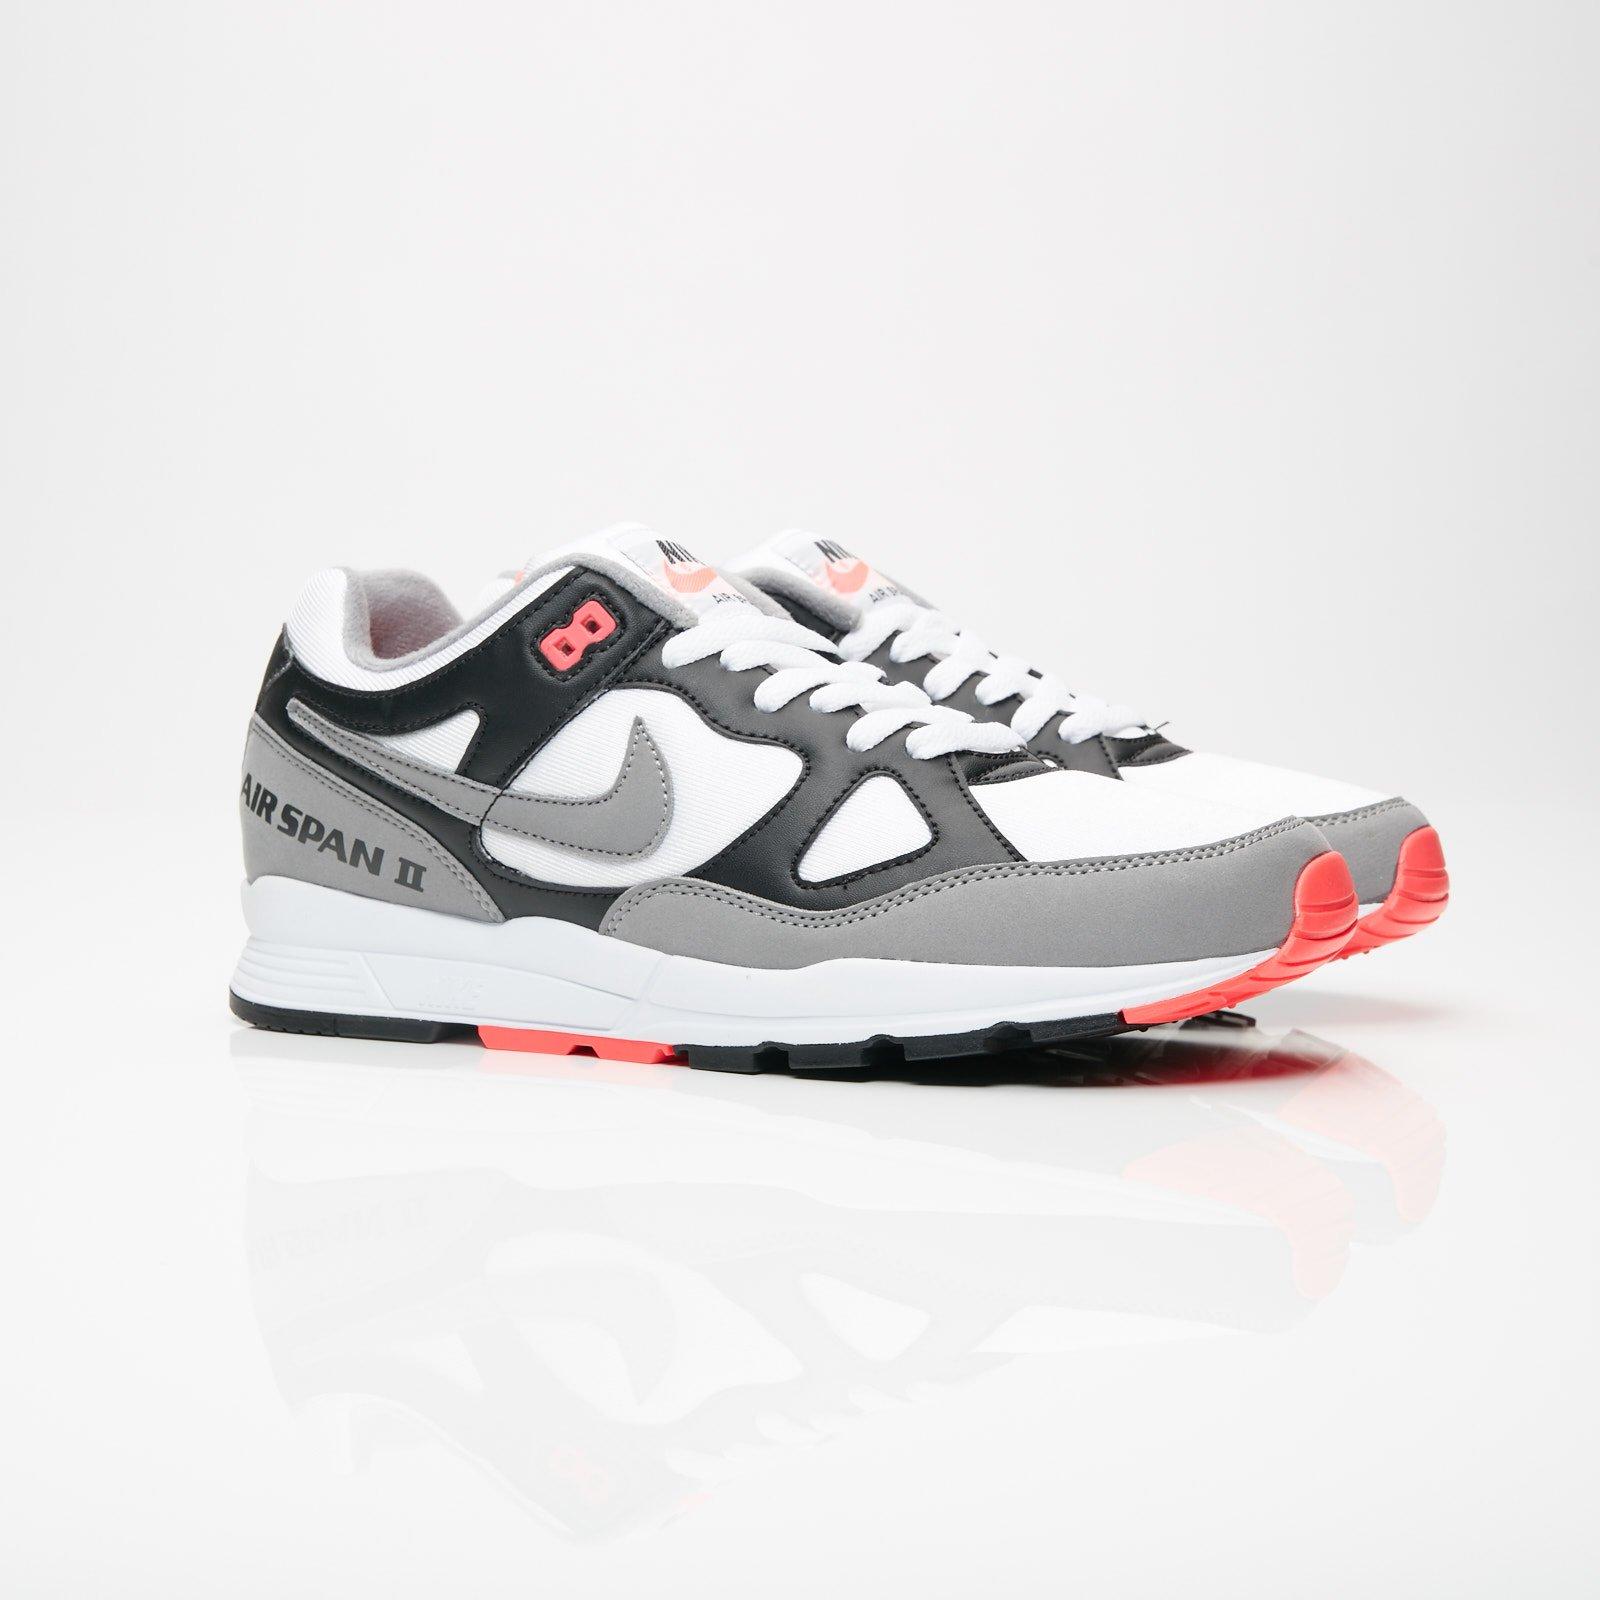 best service 080e7 a9cfd Nike Sportswear Air Span II